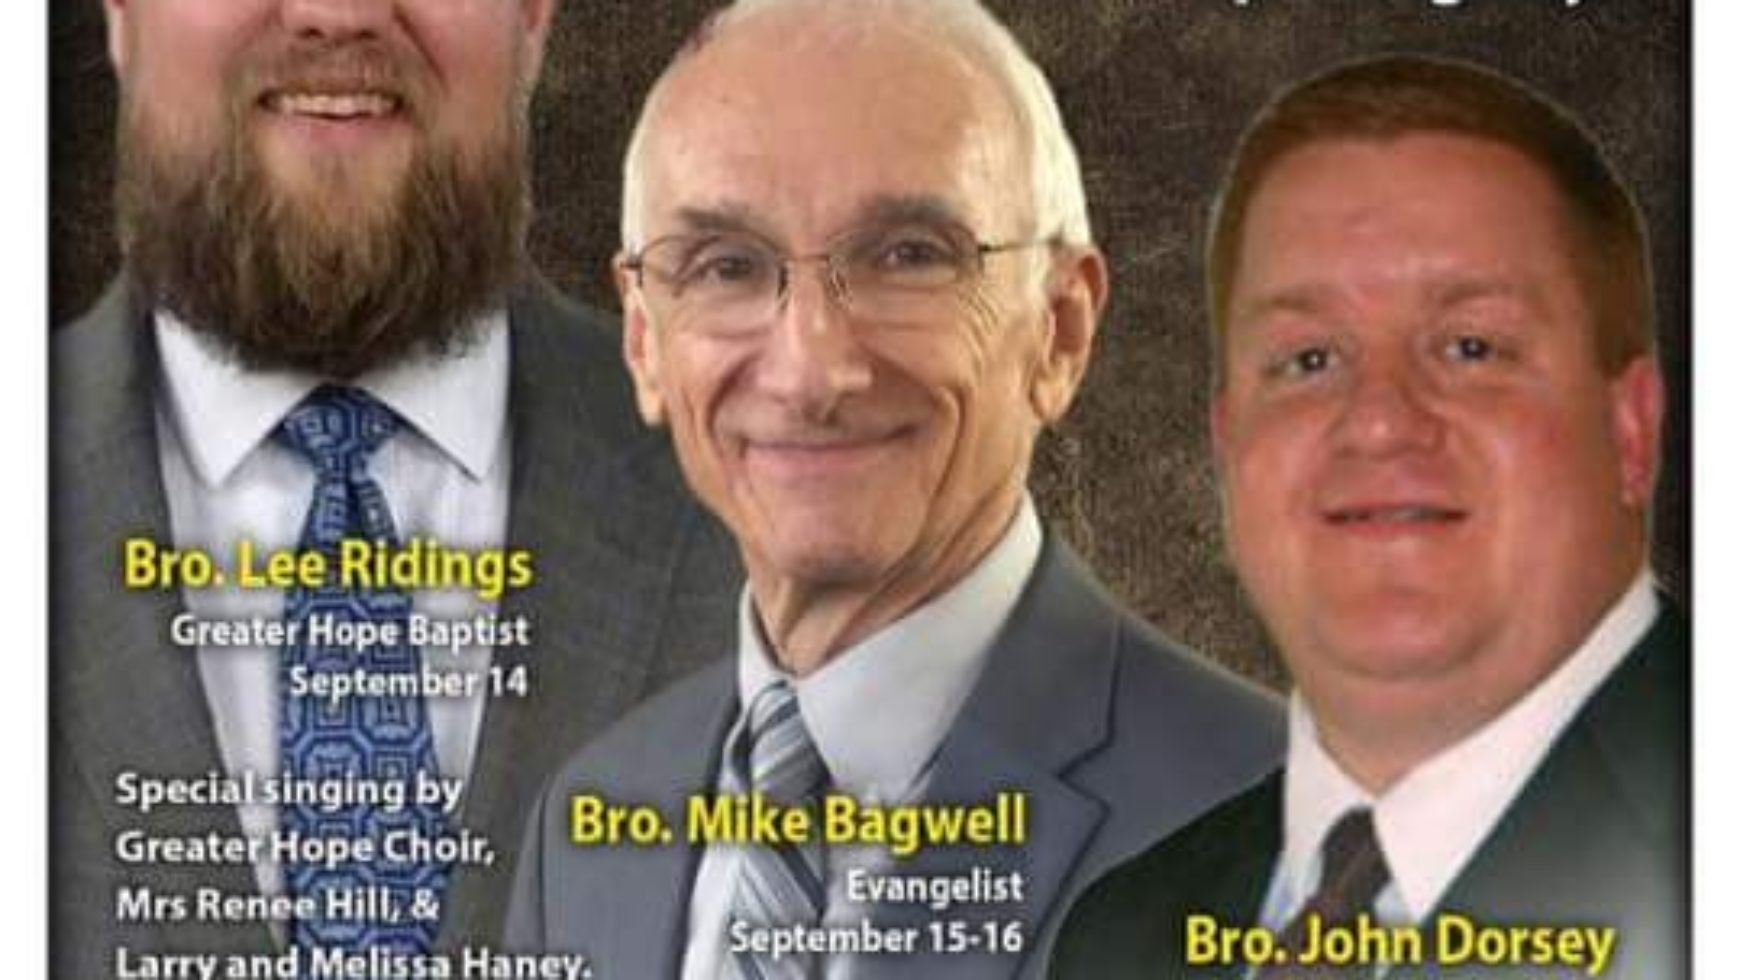 Area Meeting: Revival Services – New Brooklyn Baptist Church – Temple, GA